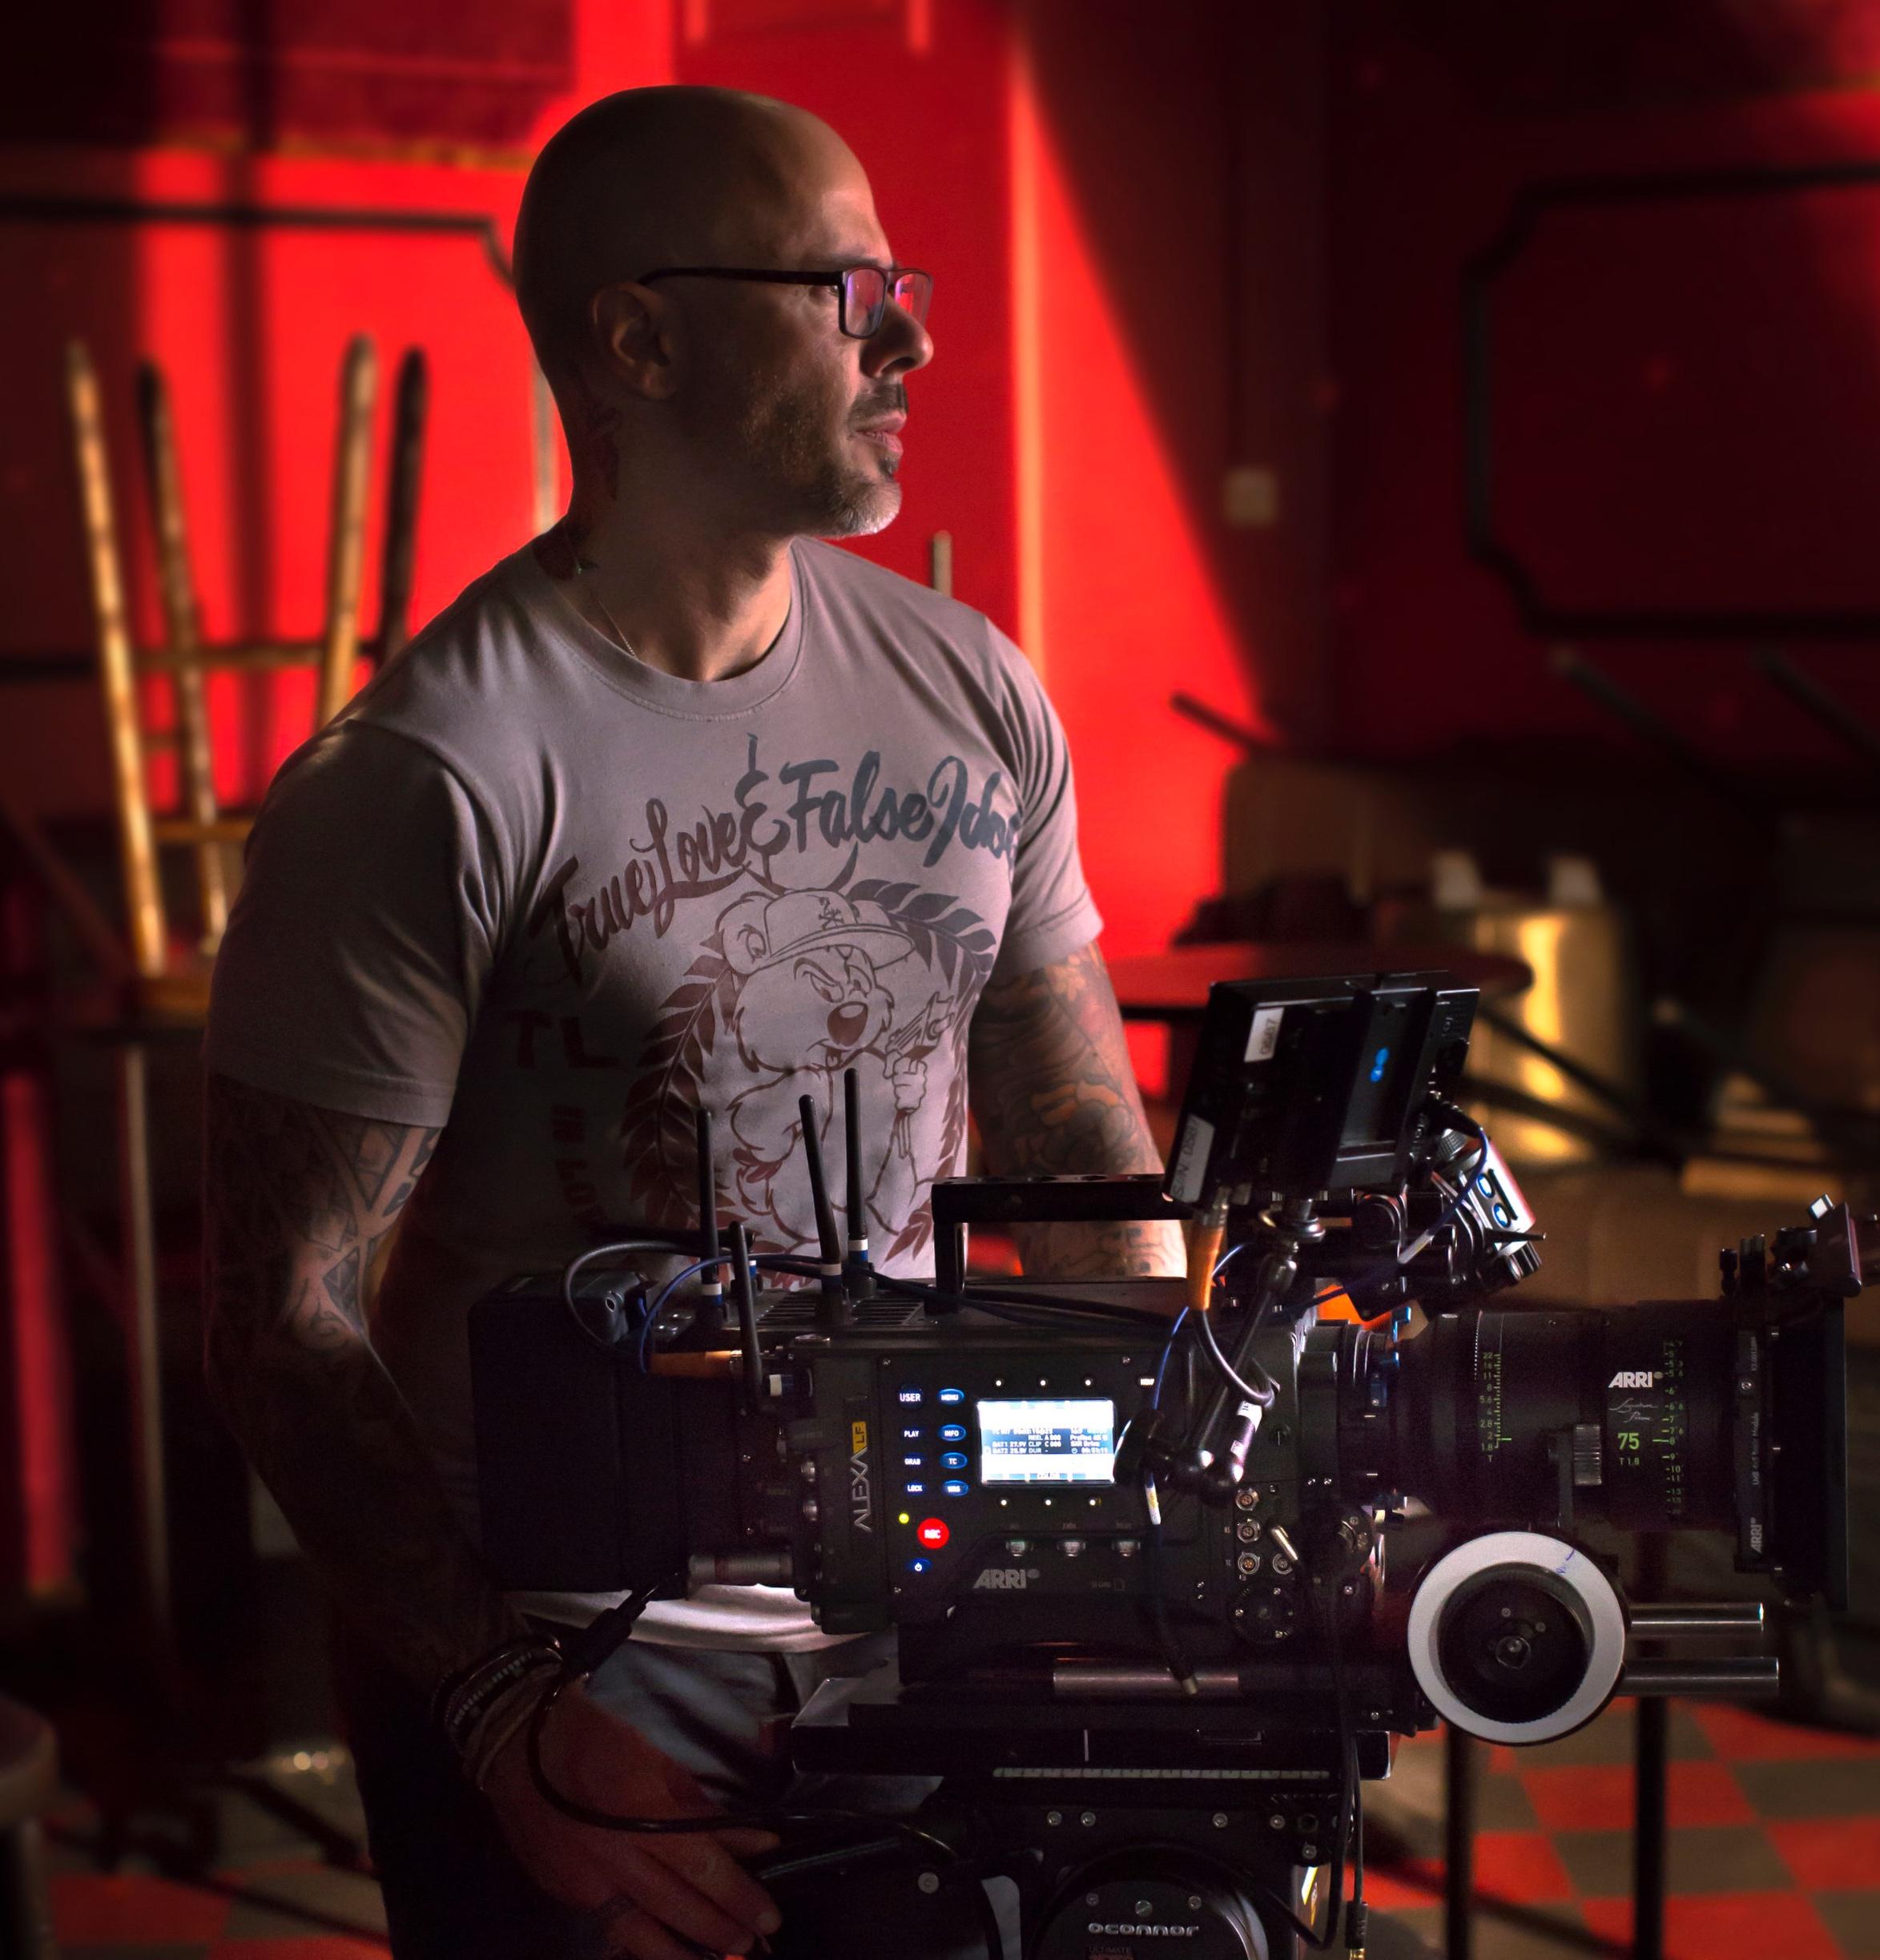 Alex Sapienza, Cinematographer